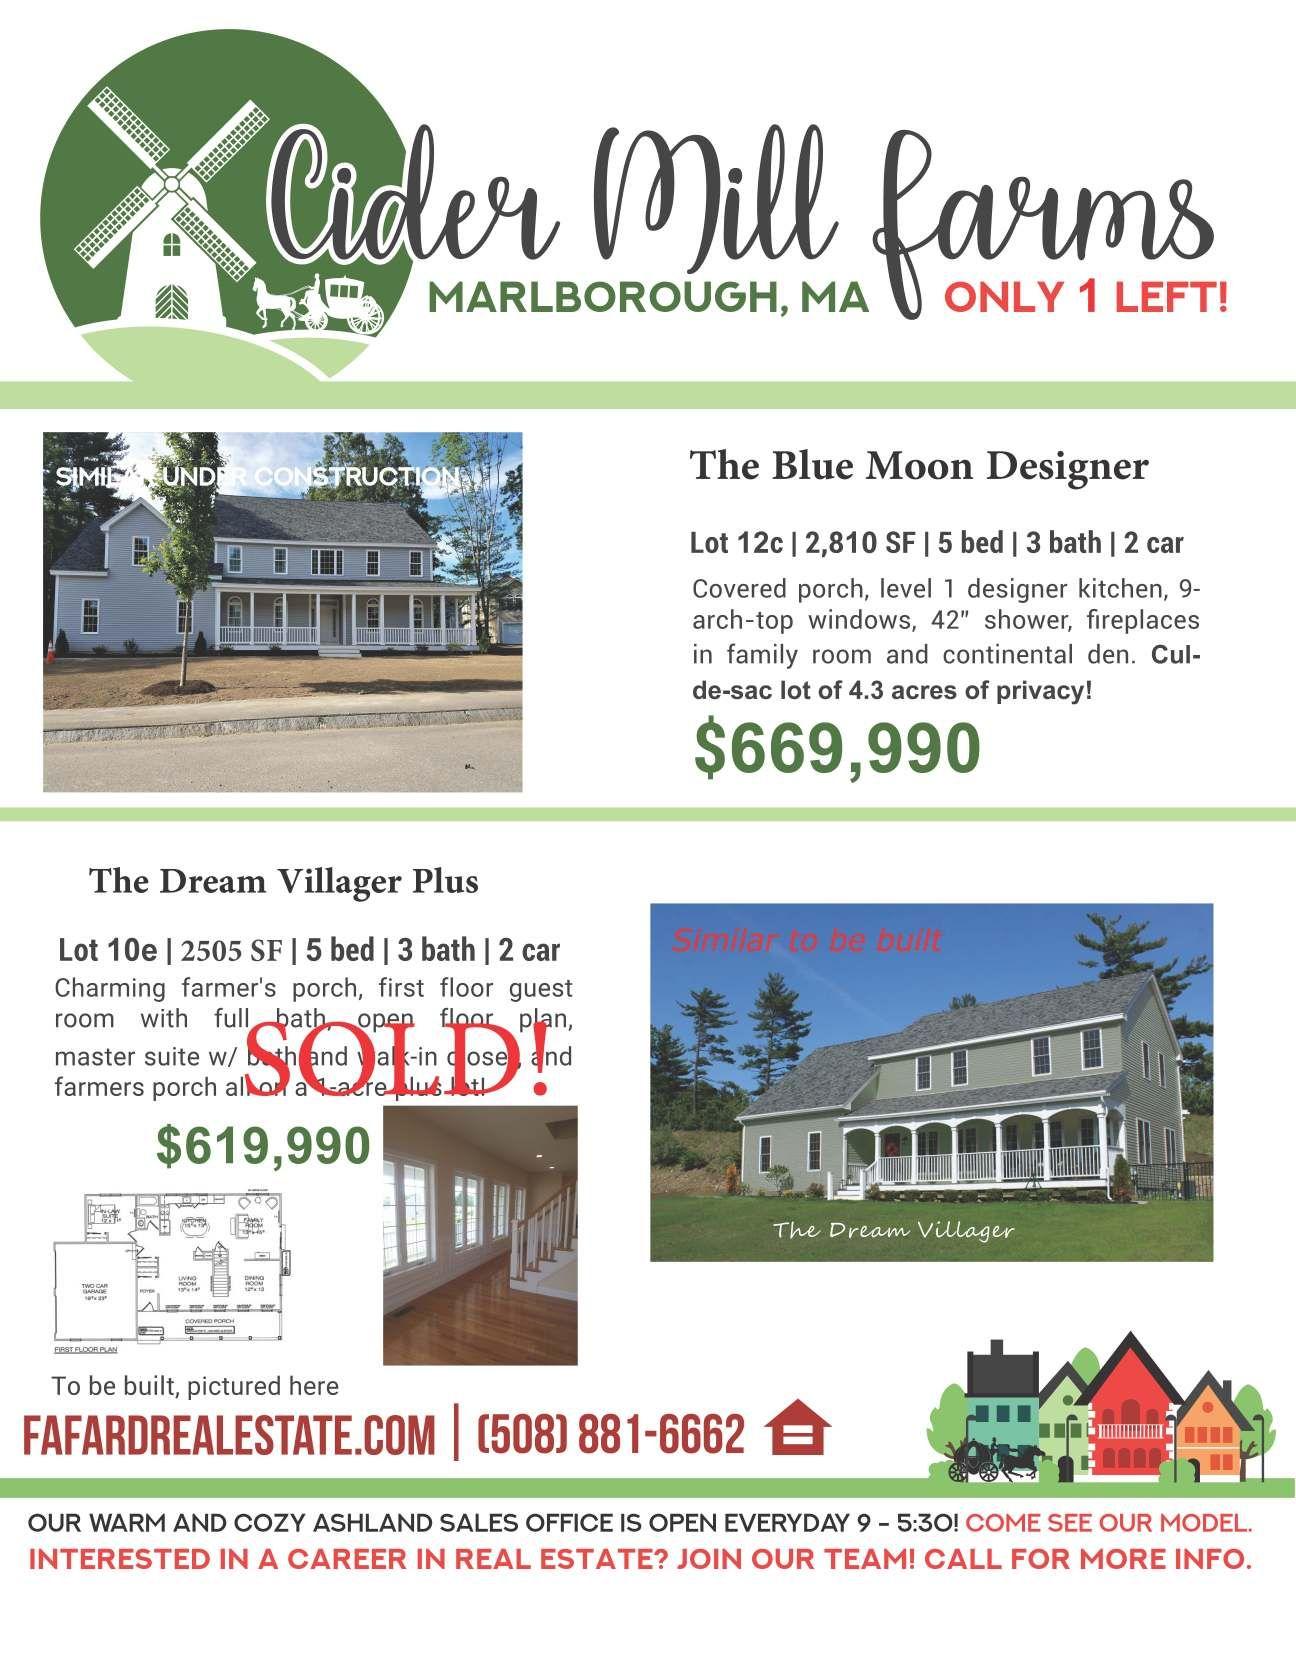 Last New Home In Cider Mill Farms Marlborough Ma 669 990 Near I 290 495 New Homes Mill Farm Real Estate